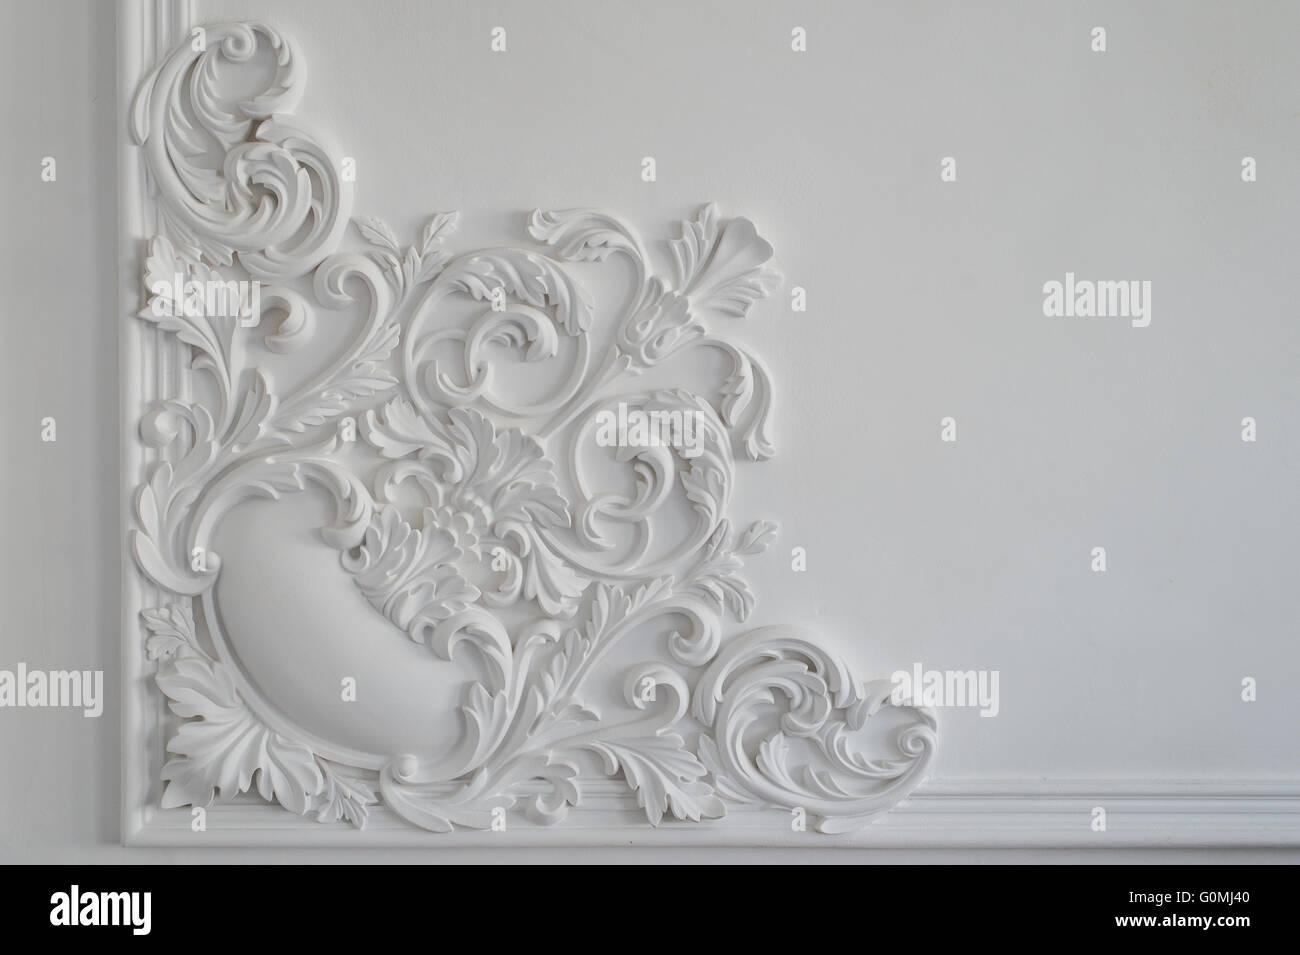 White wall molding with geometric shape and vanishing point. Horizontal - Stock Image